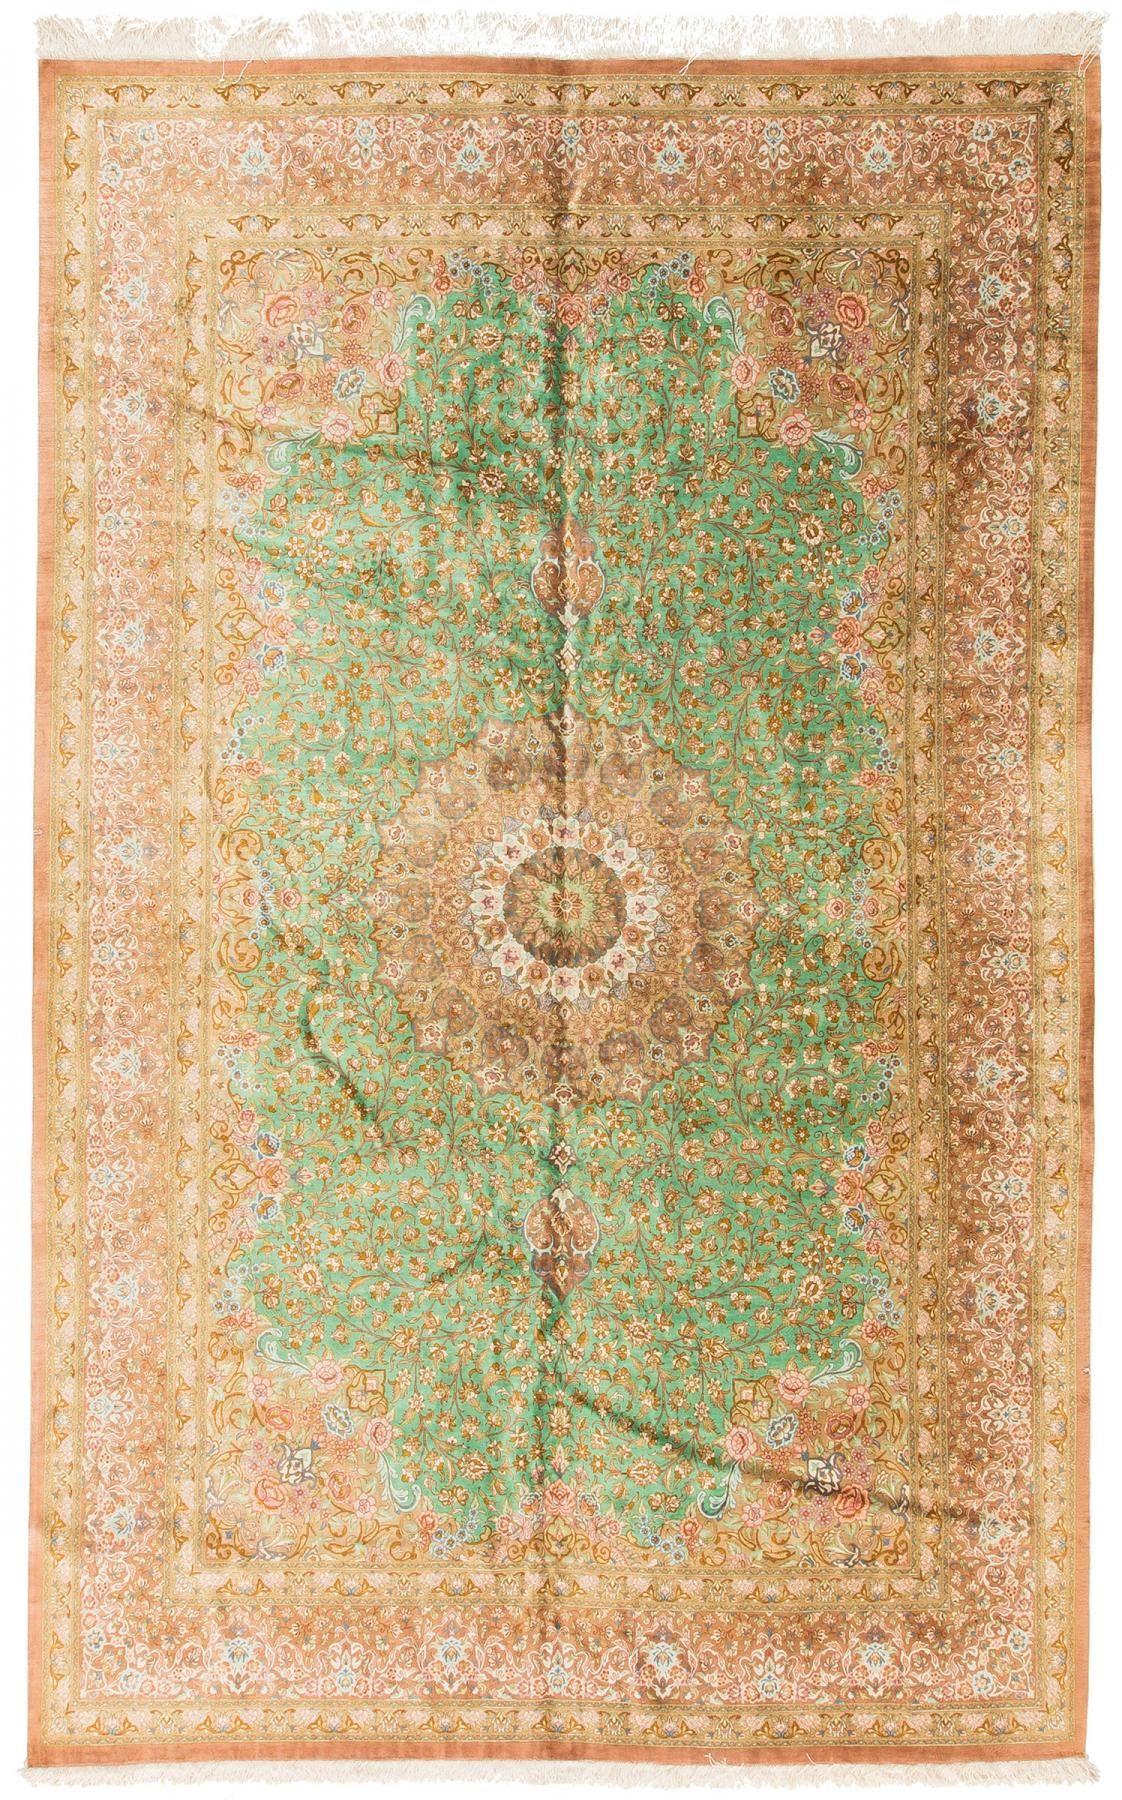 Rug Pf166406 Persian Qum Persian Classics Area Rugs By Safavieh Green Rug Persian Carpet Rugs